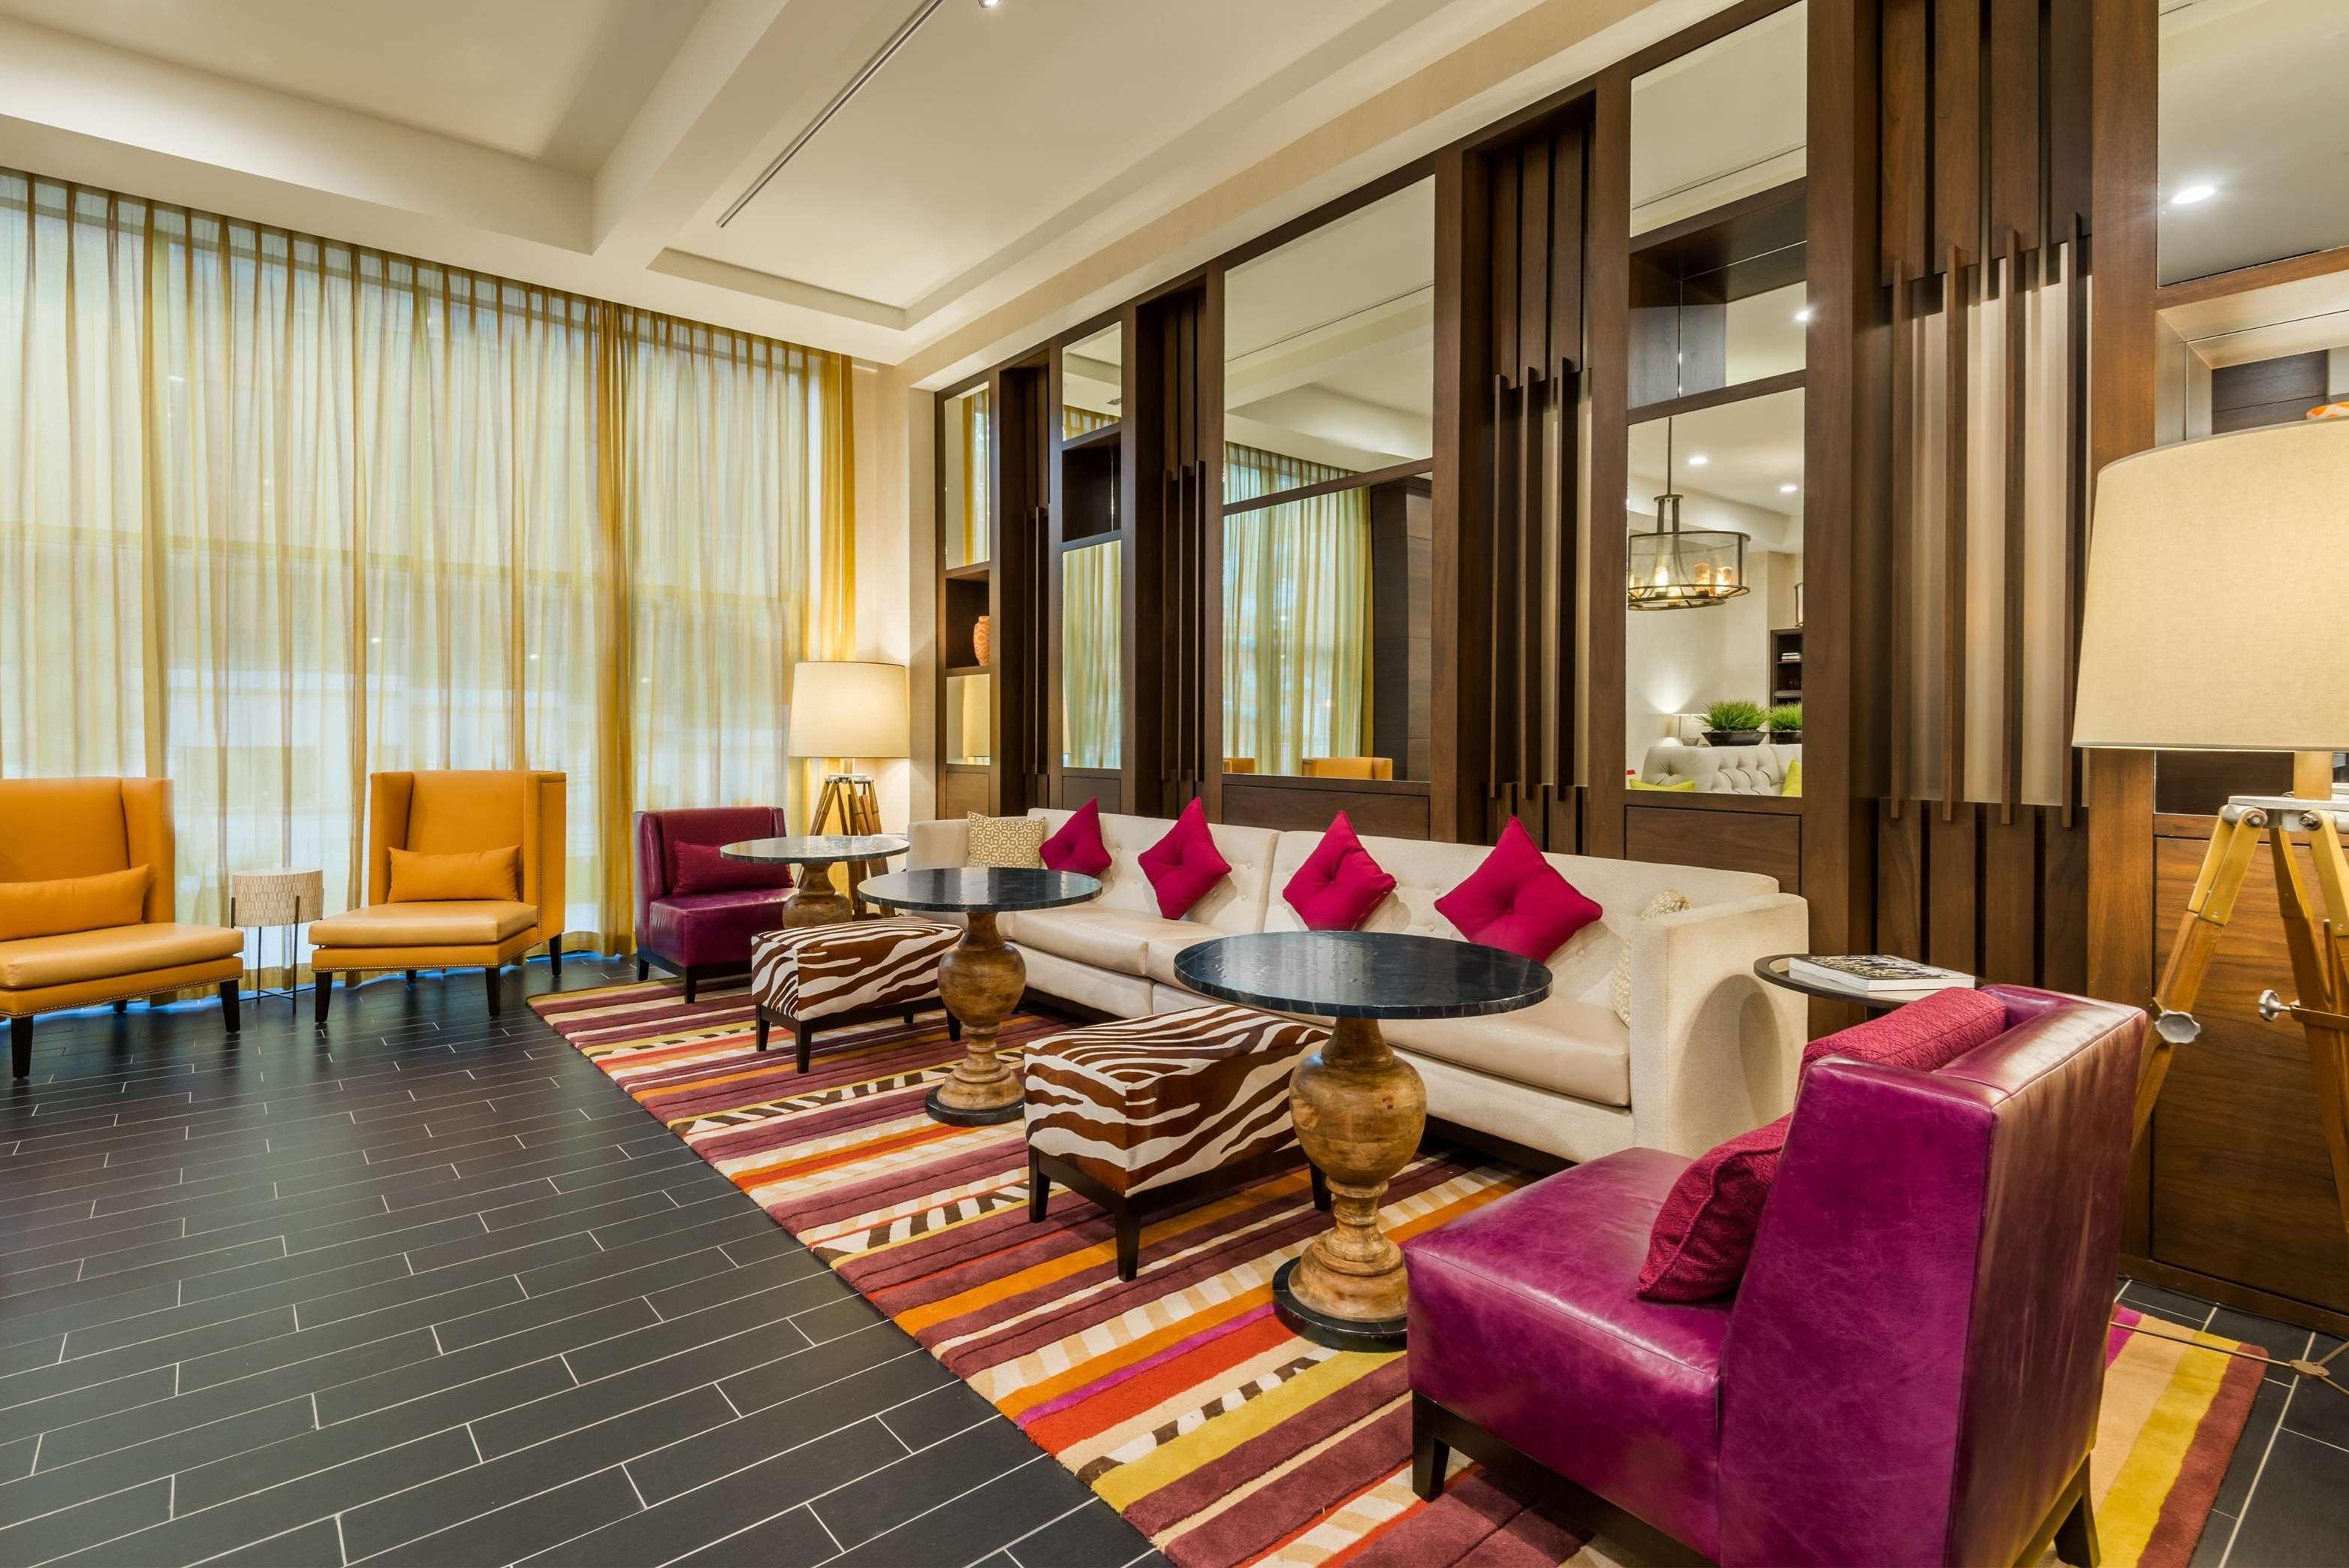 Home2 Suites by Hilton Atlanta Downtown image 22